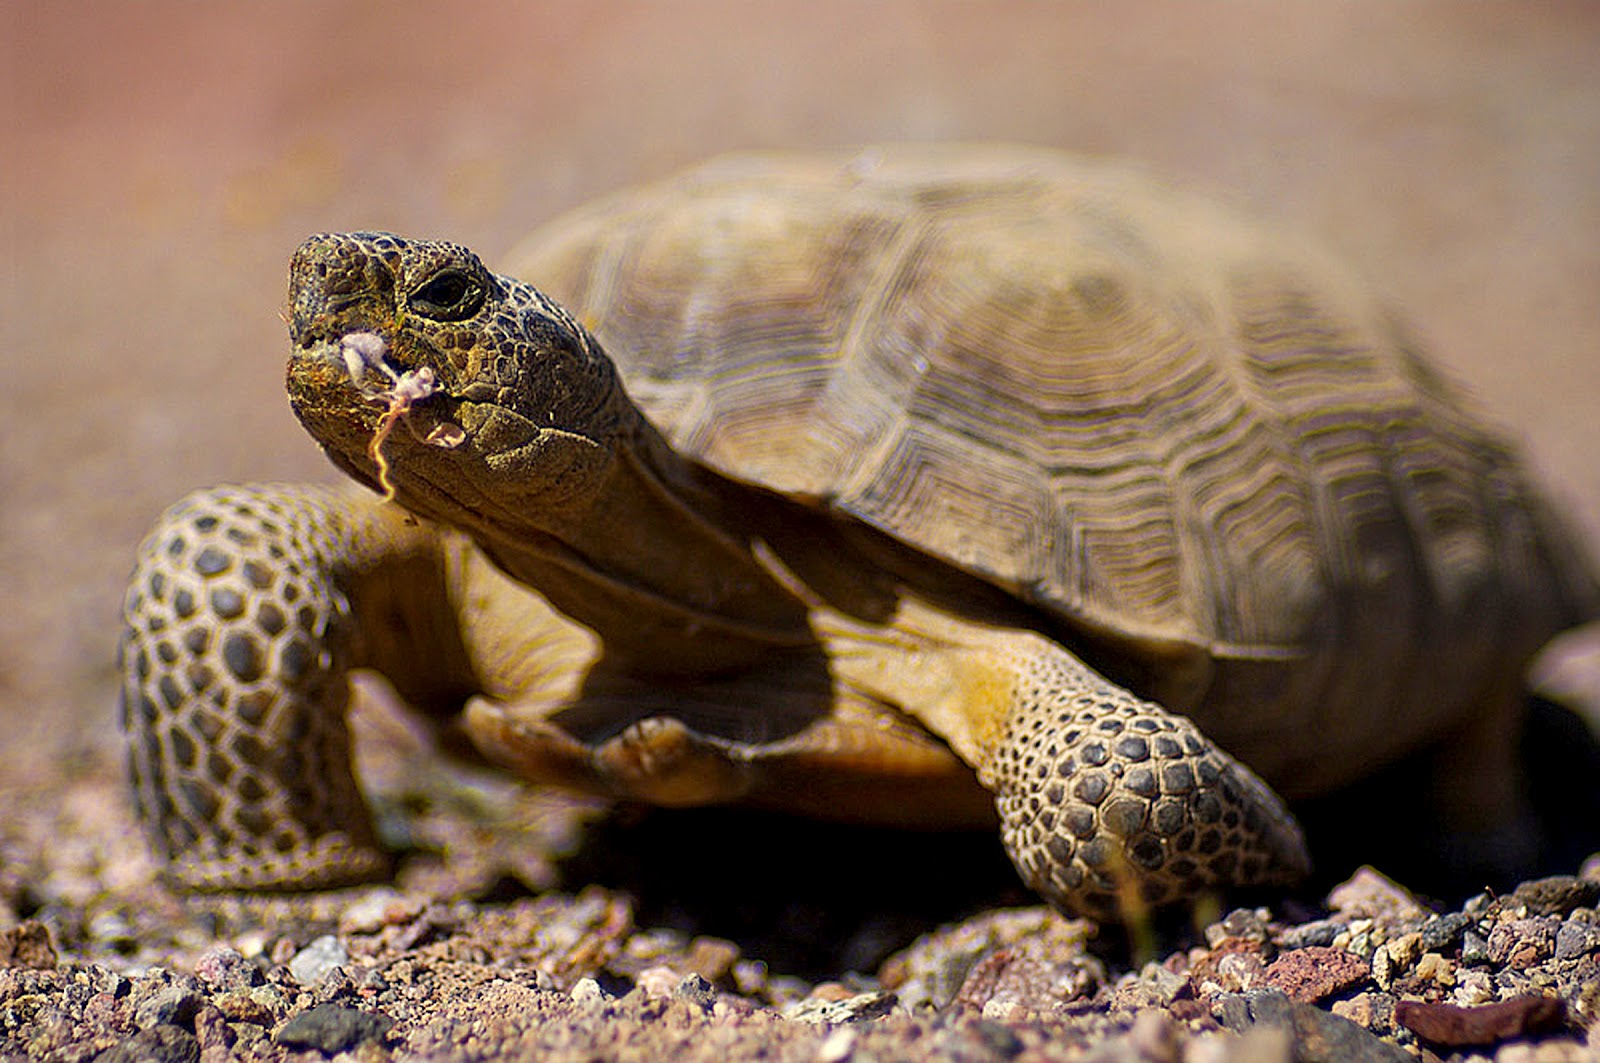 Tortoise Not Eating Food